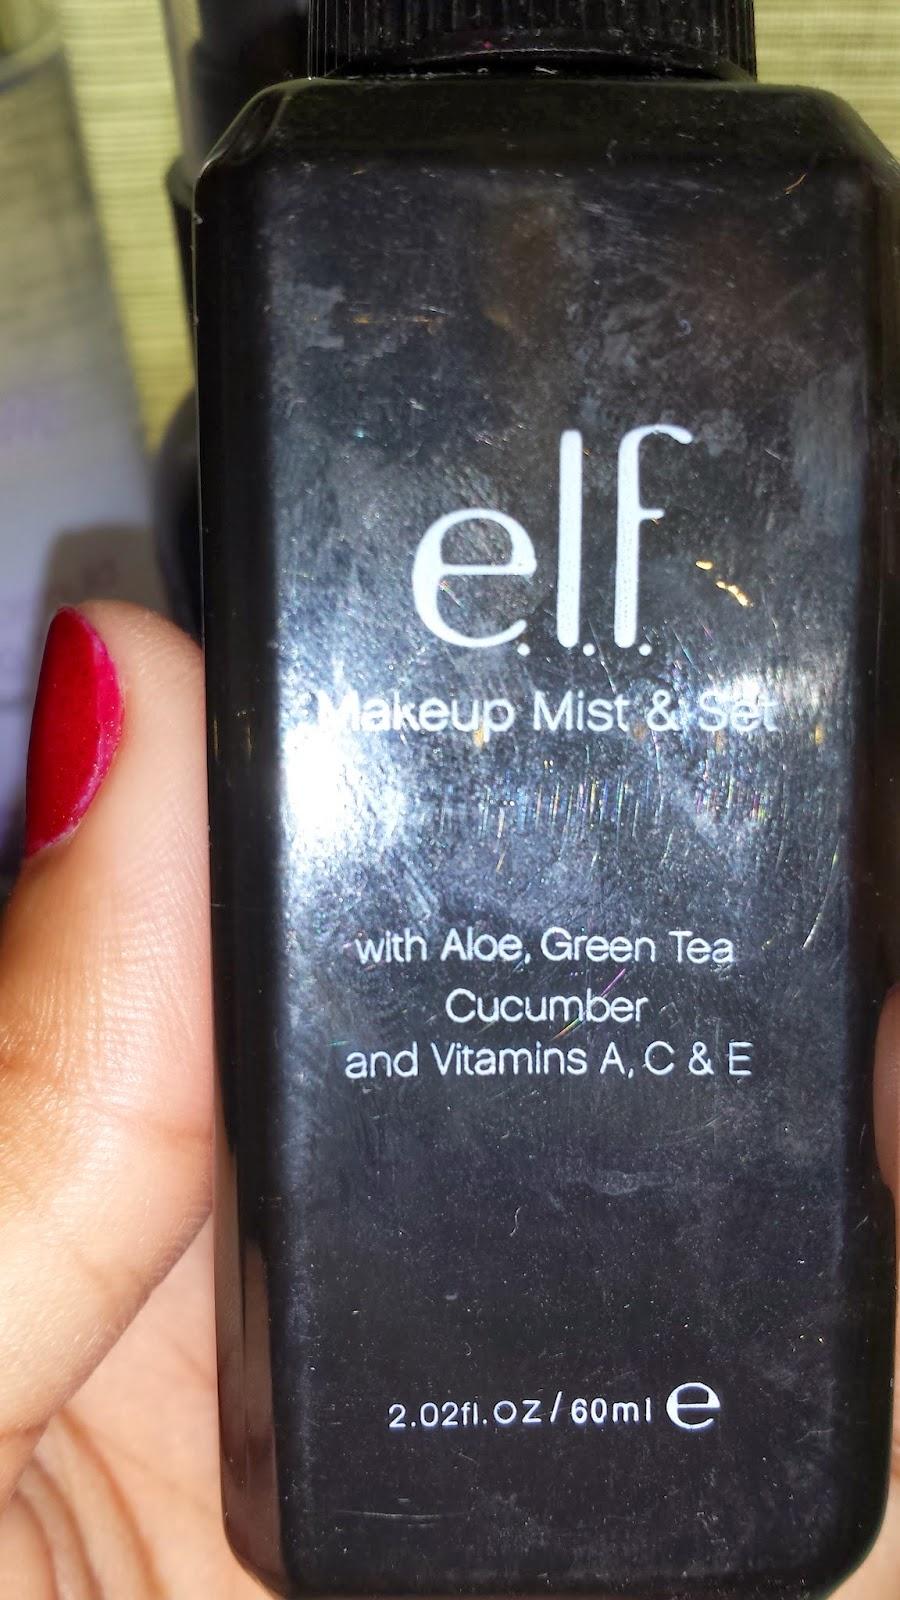 e.l.f Makeup Mist & Set - www.modenmakeup.com